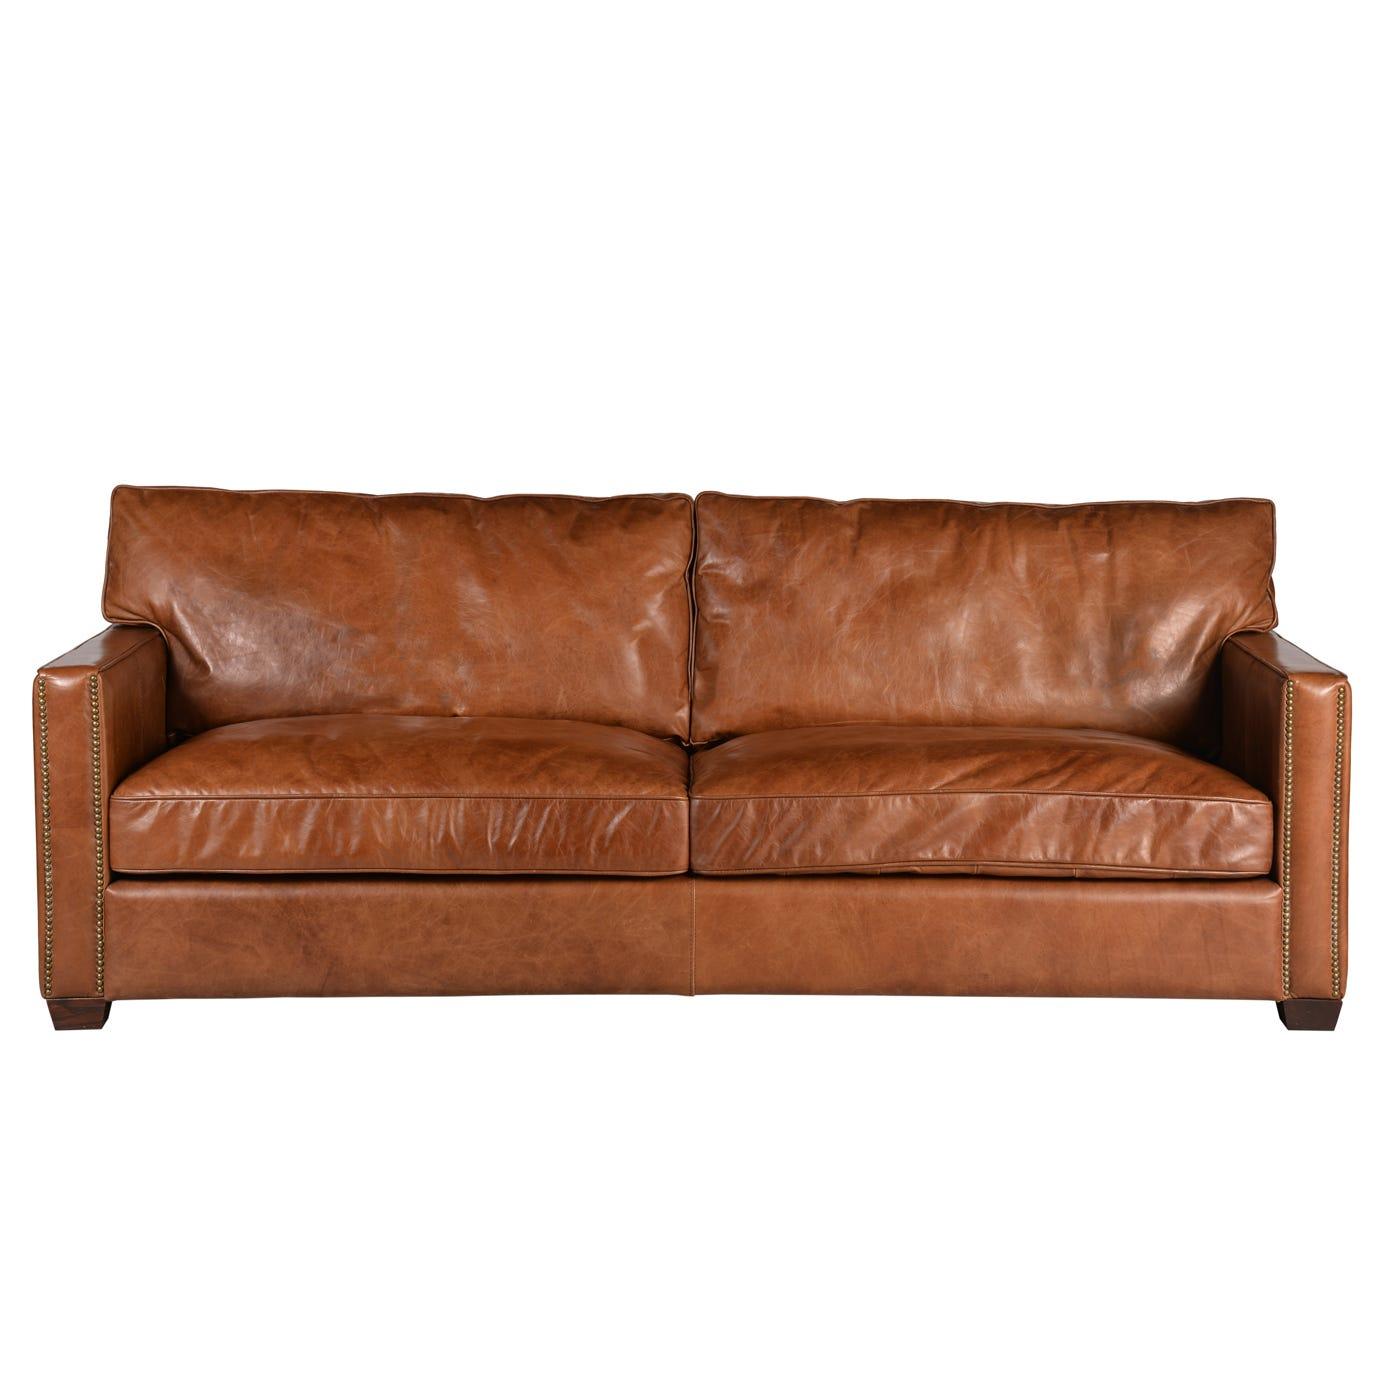 Viscount William 3 Seater Sofa Old Saddle Leather Nut